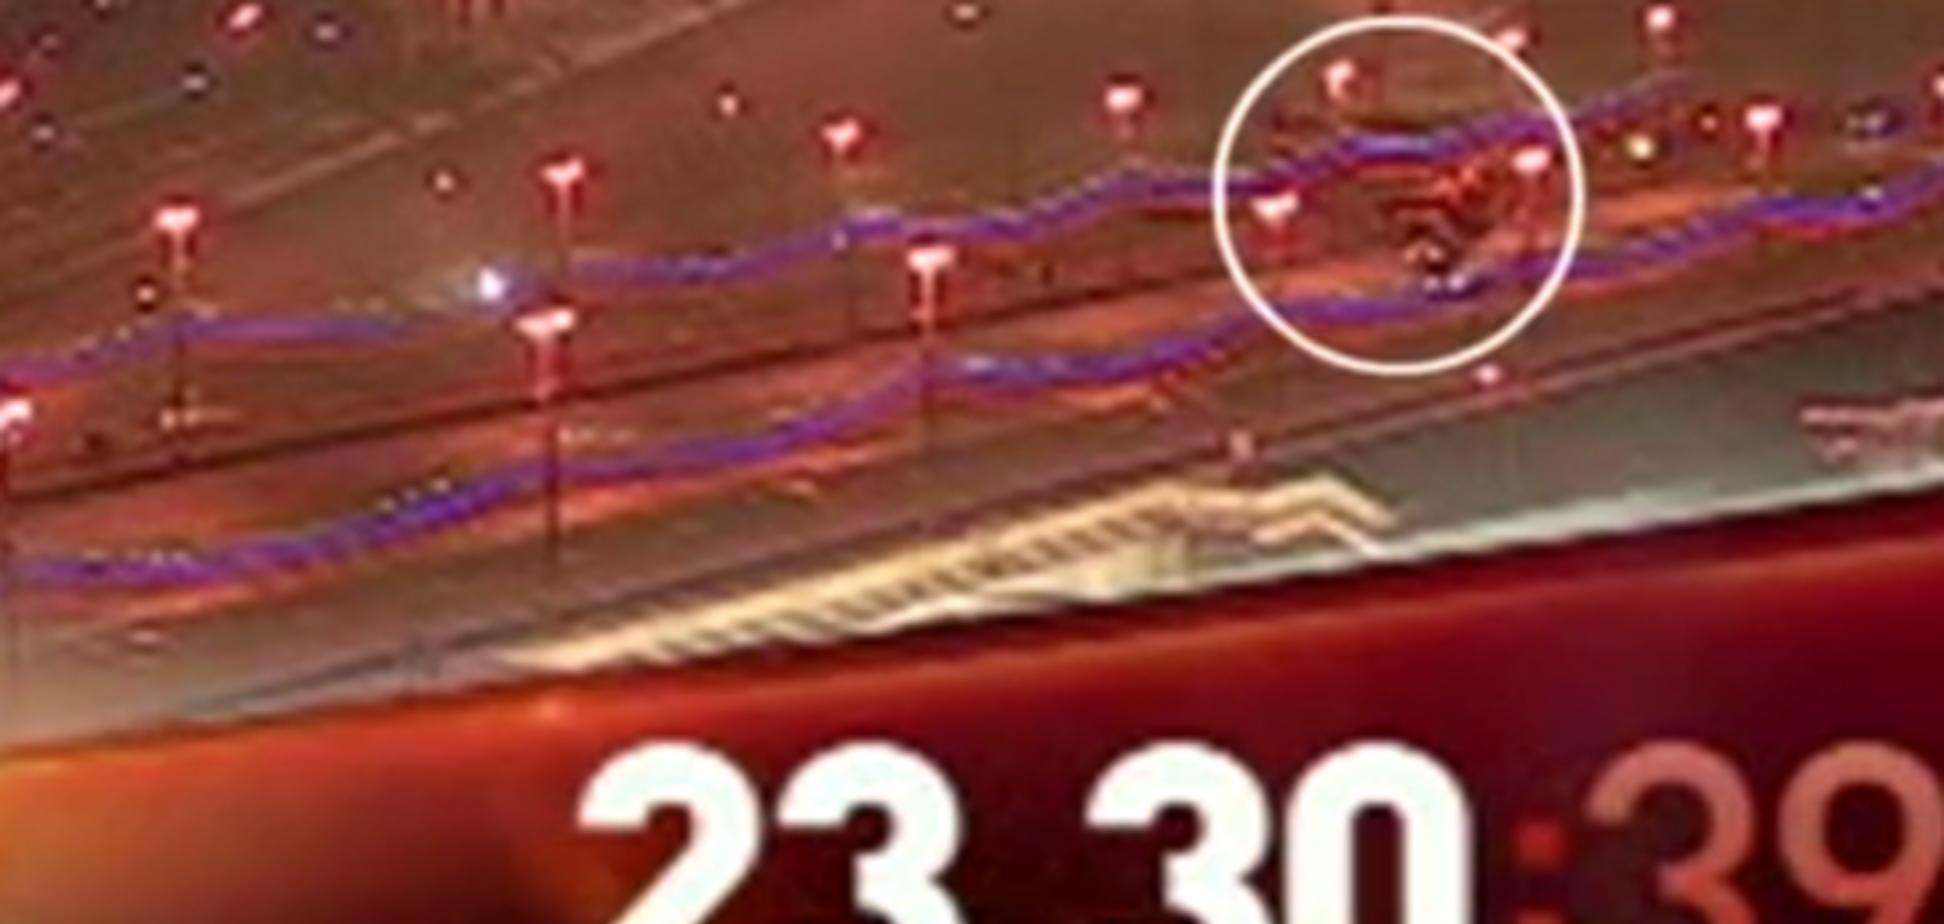 Камера зафиксировала момент убийства Немцова: видеофакт